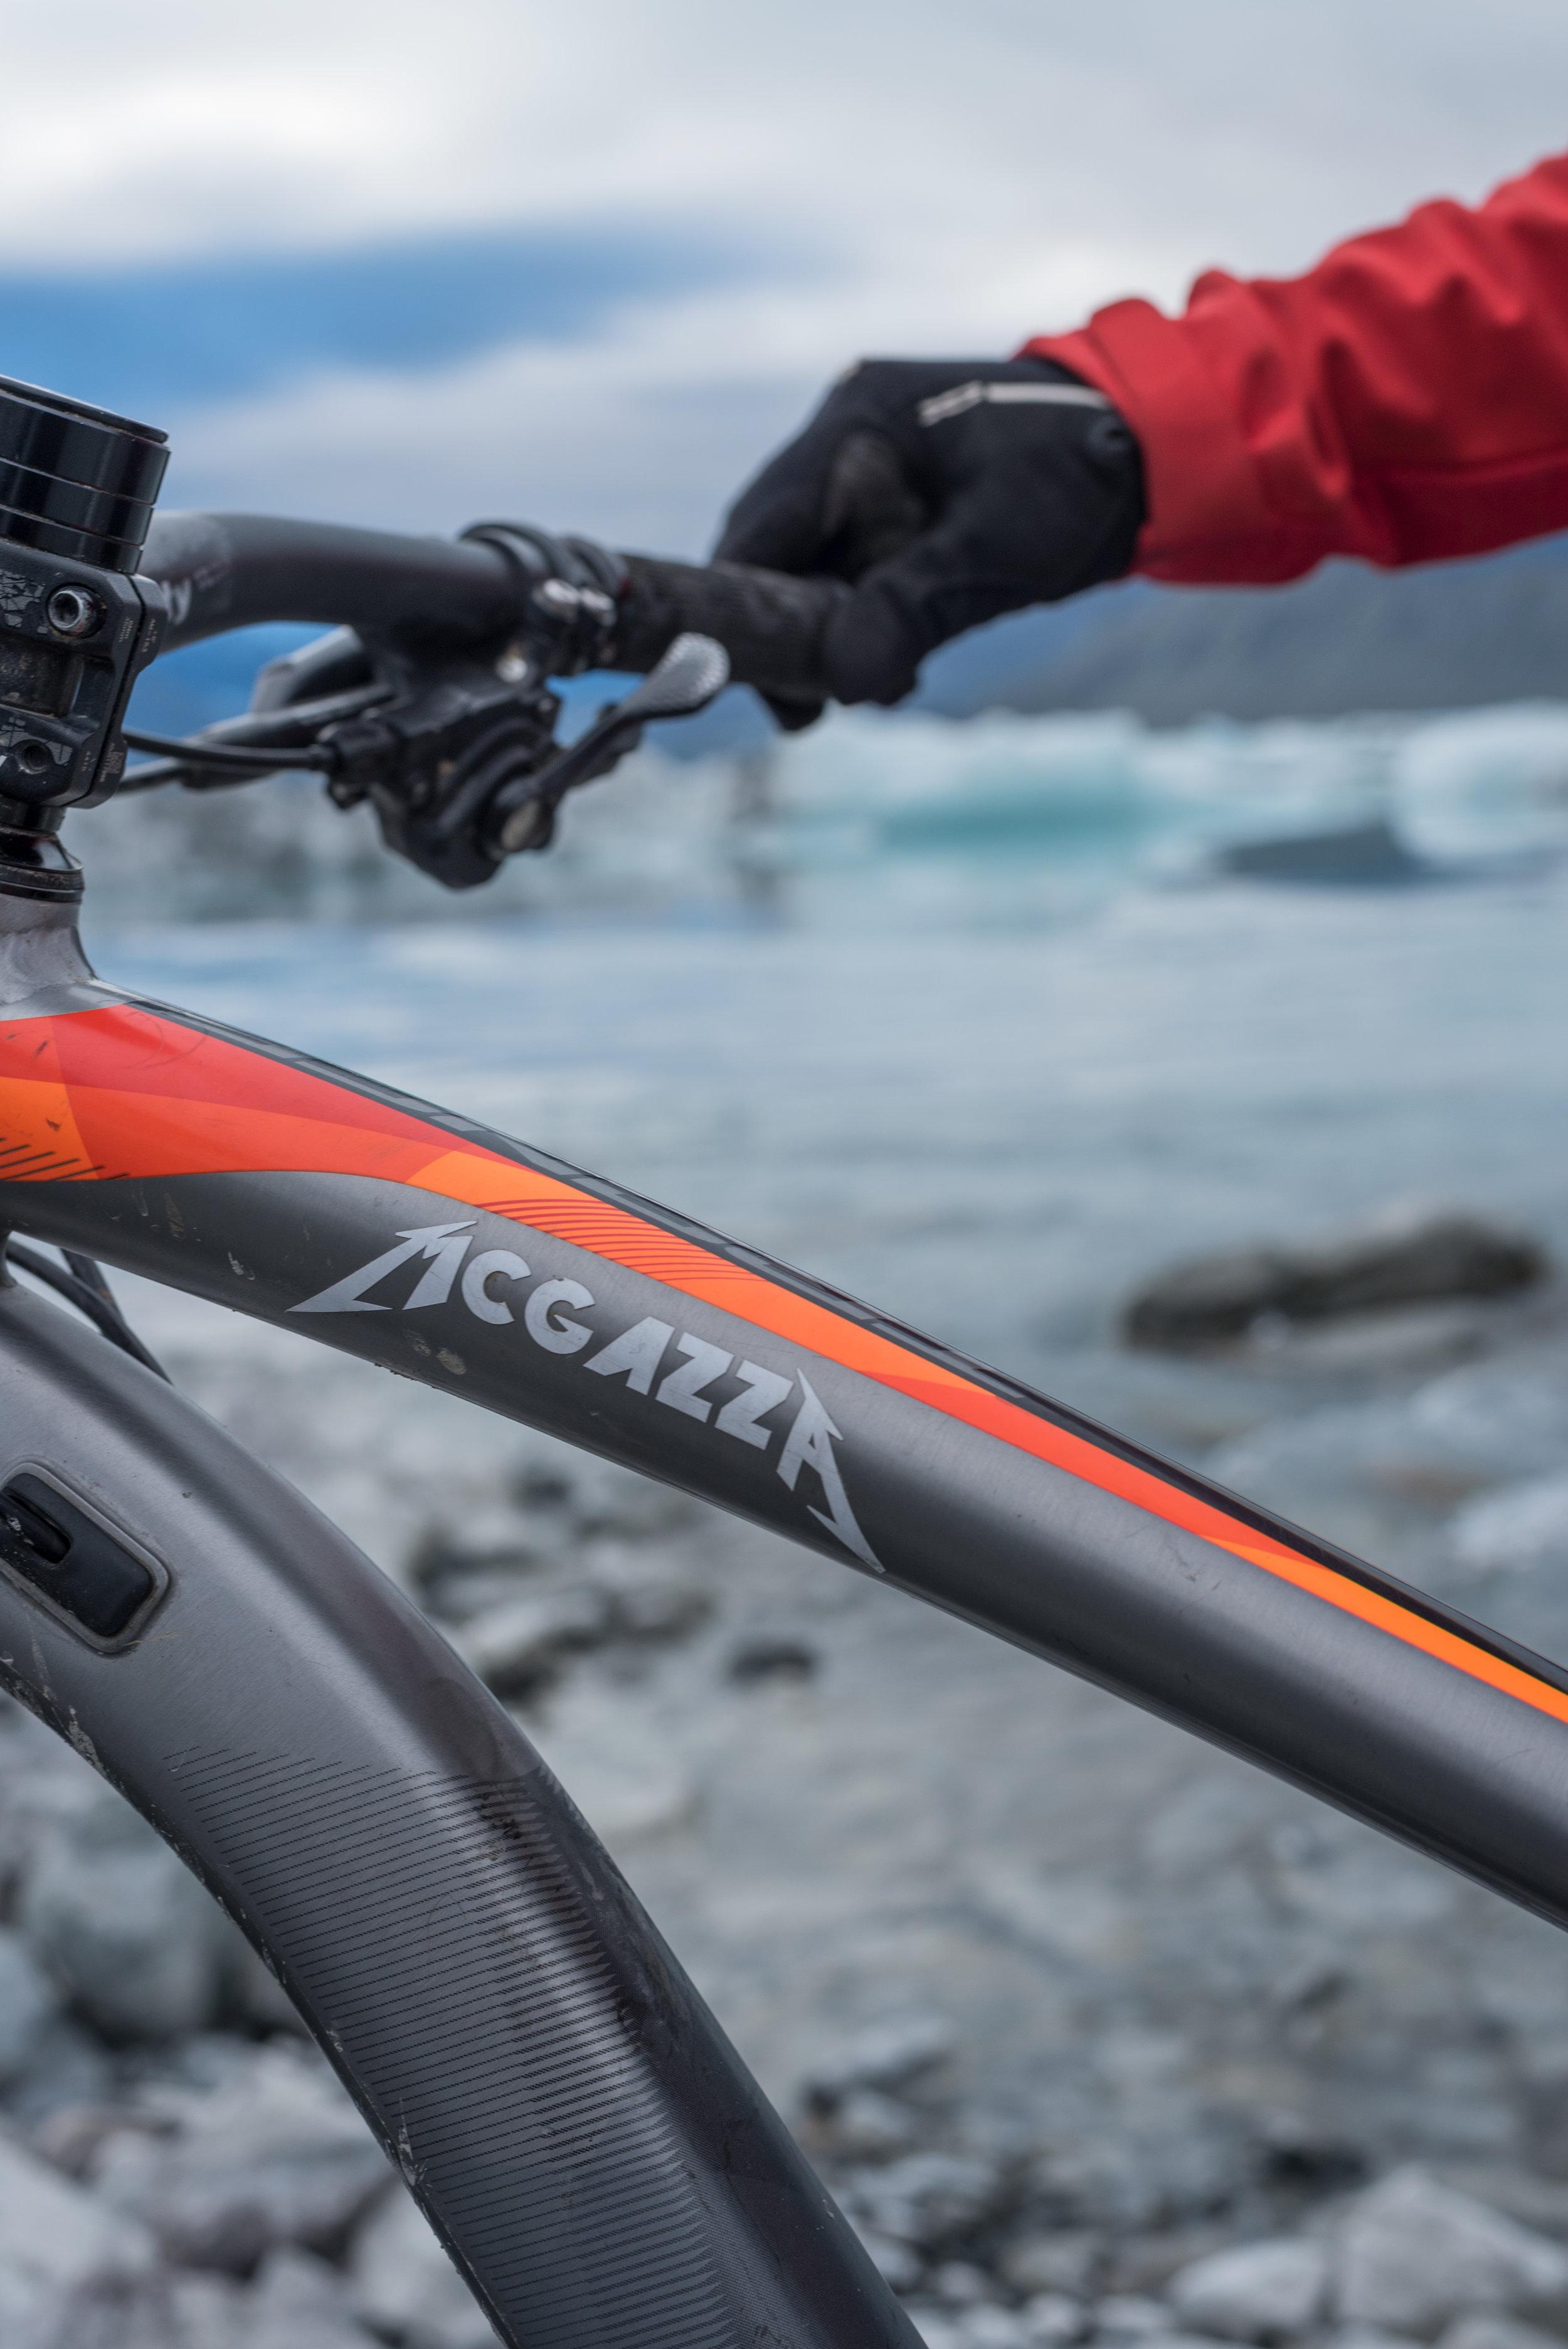 Tasman-Bike-Pose11-McAzza.jpg